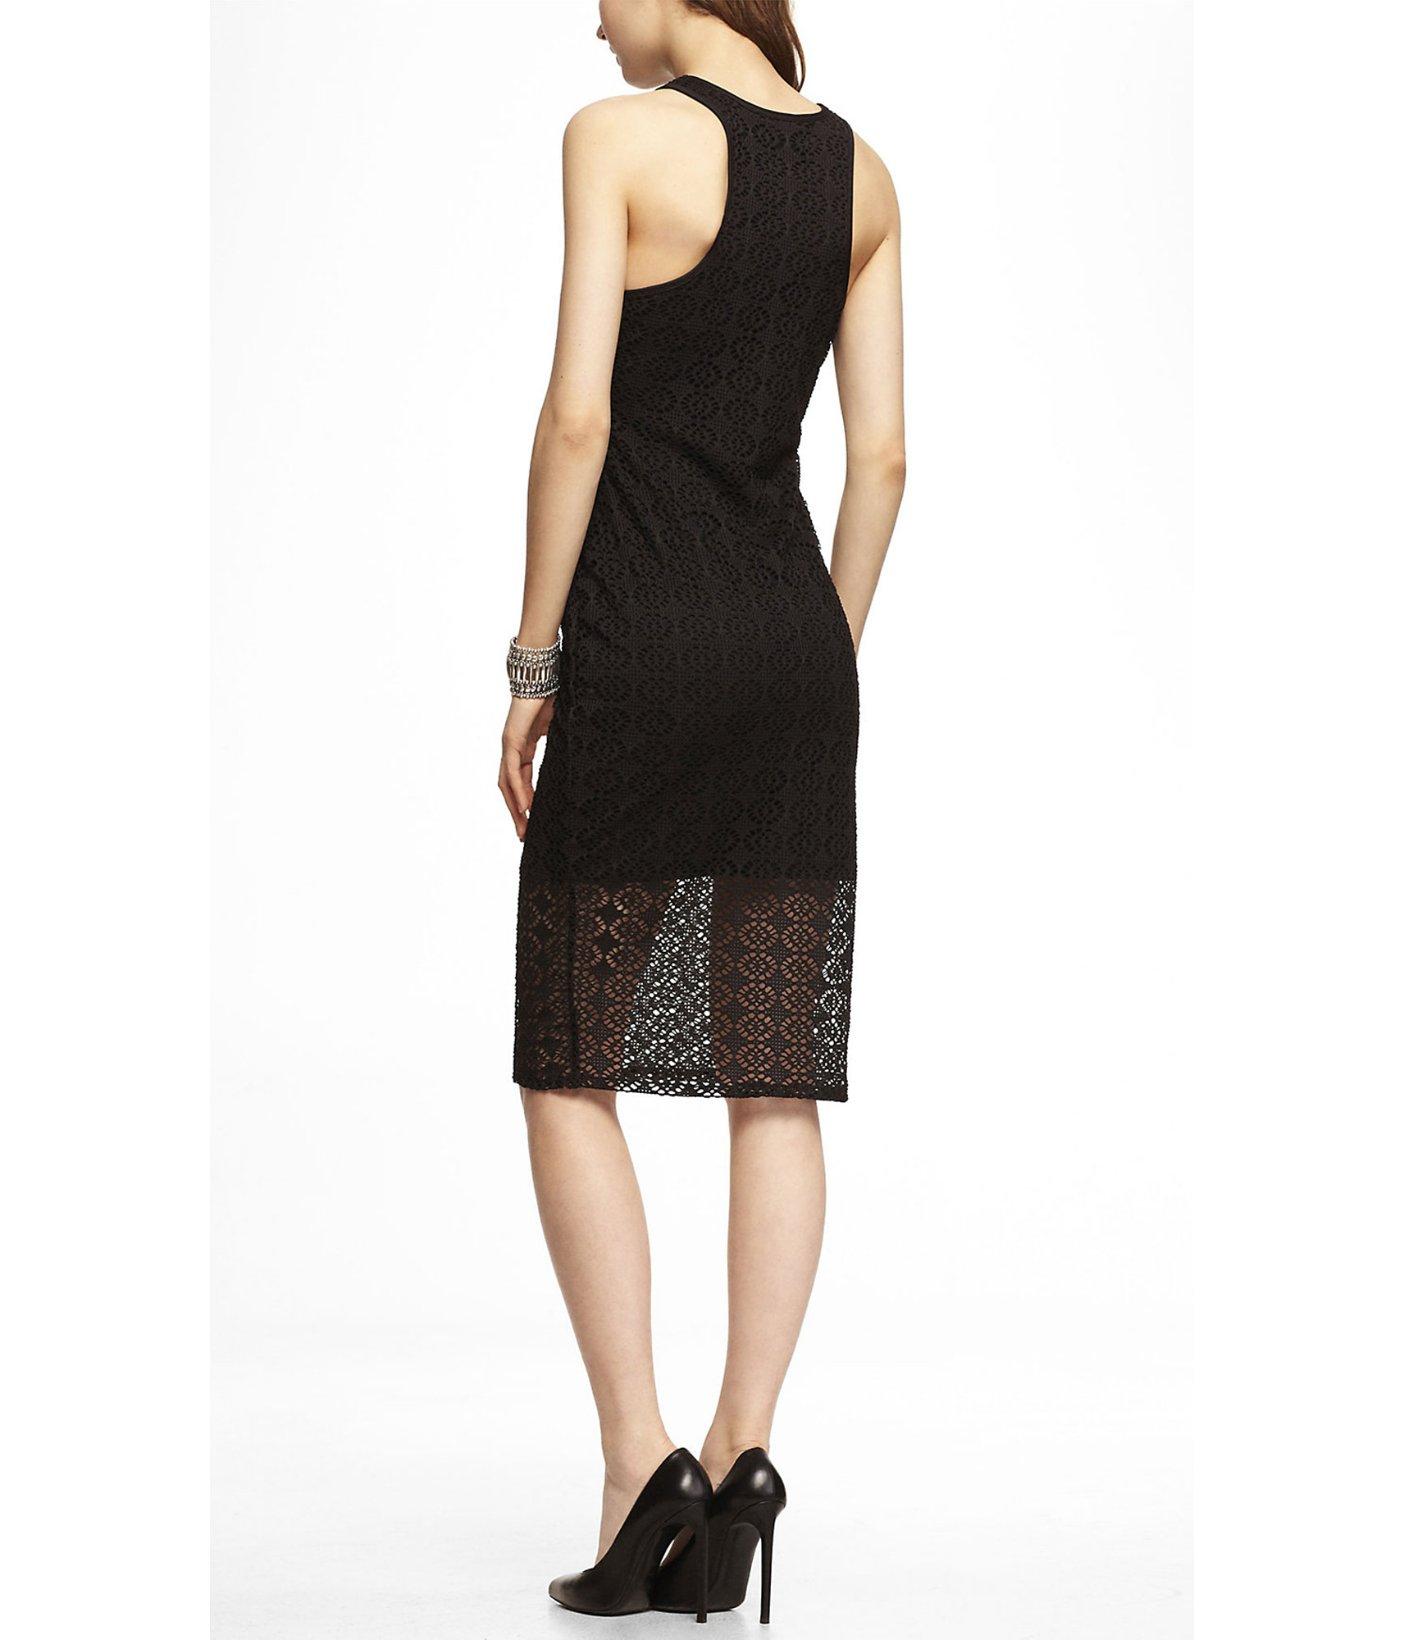 Lyst - Express Eyelet Midi Sheath Dress in Black